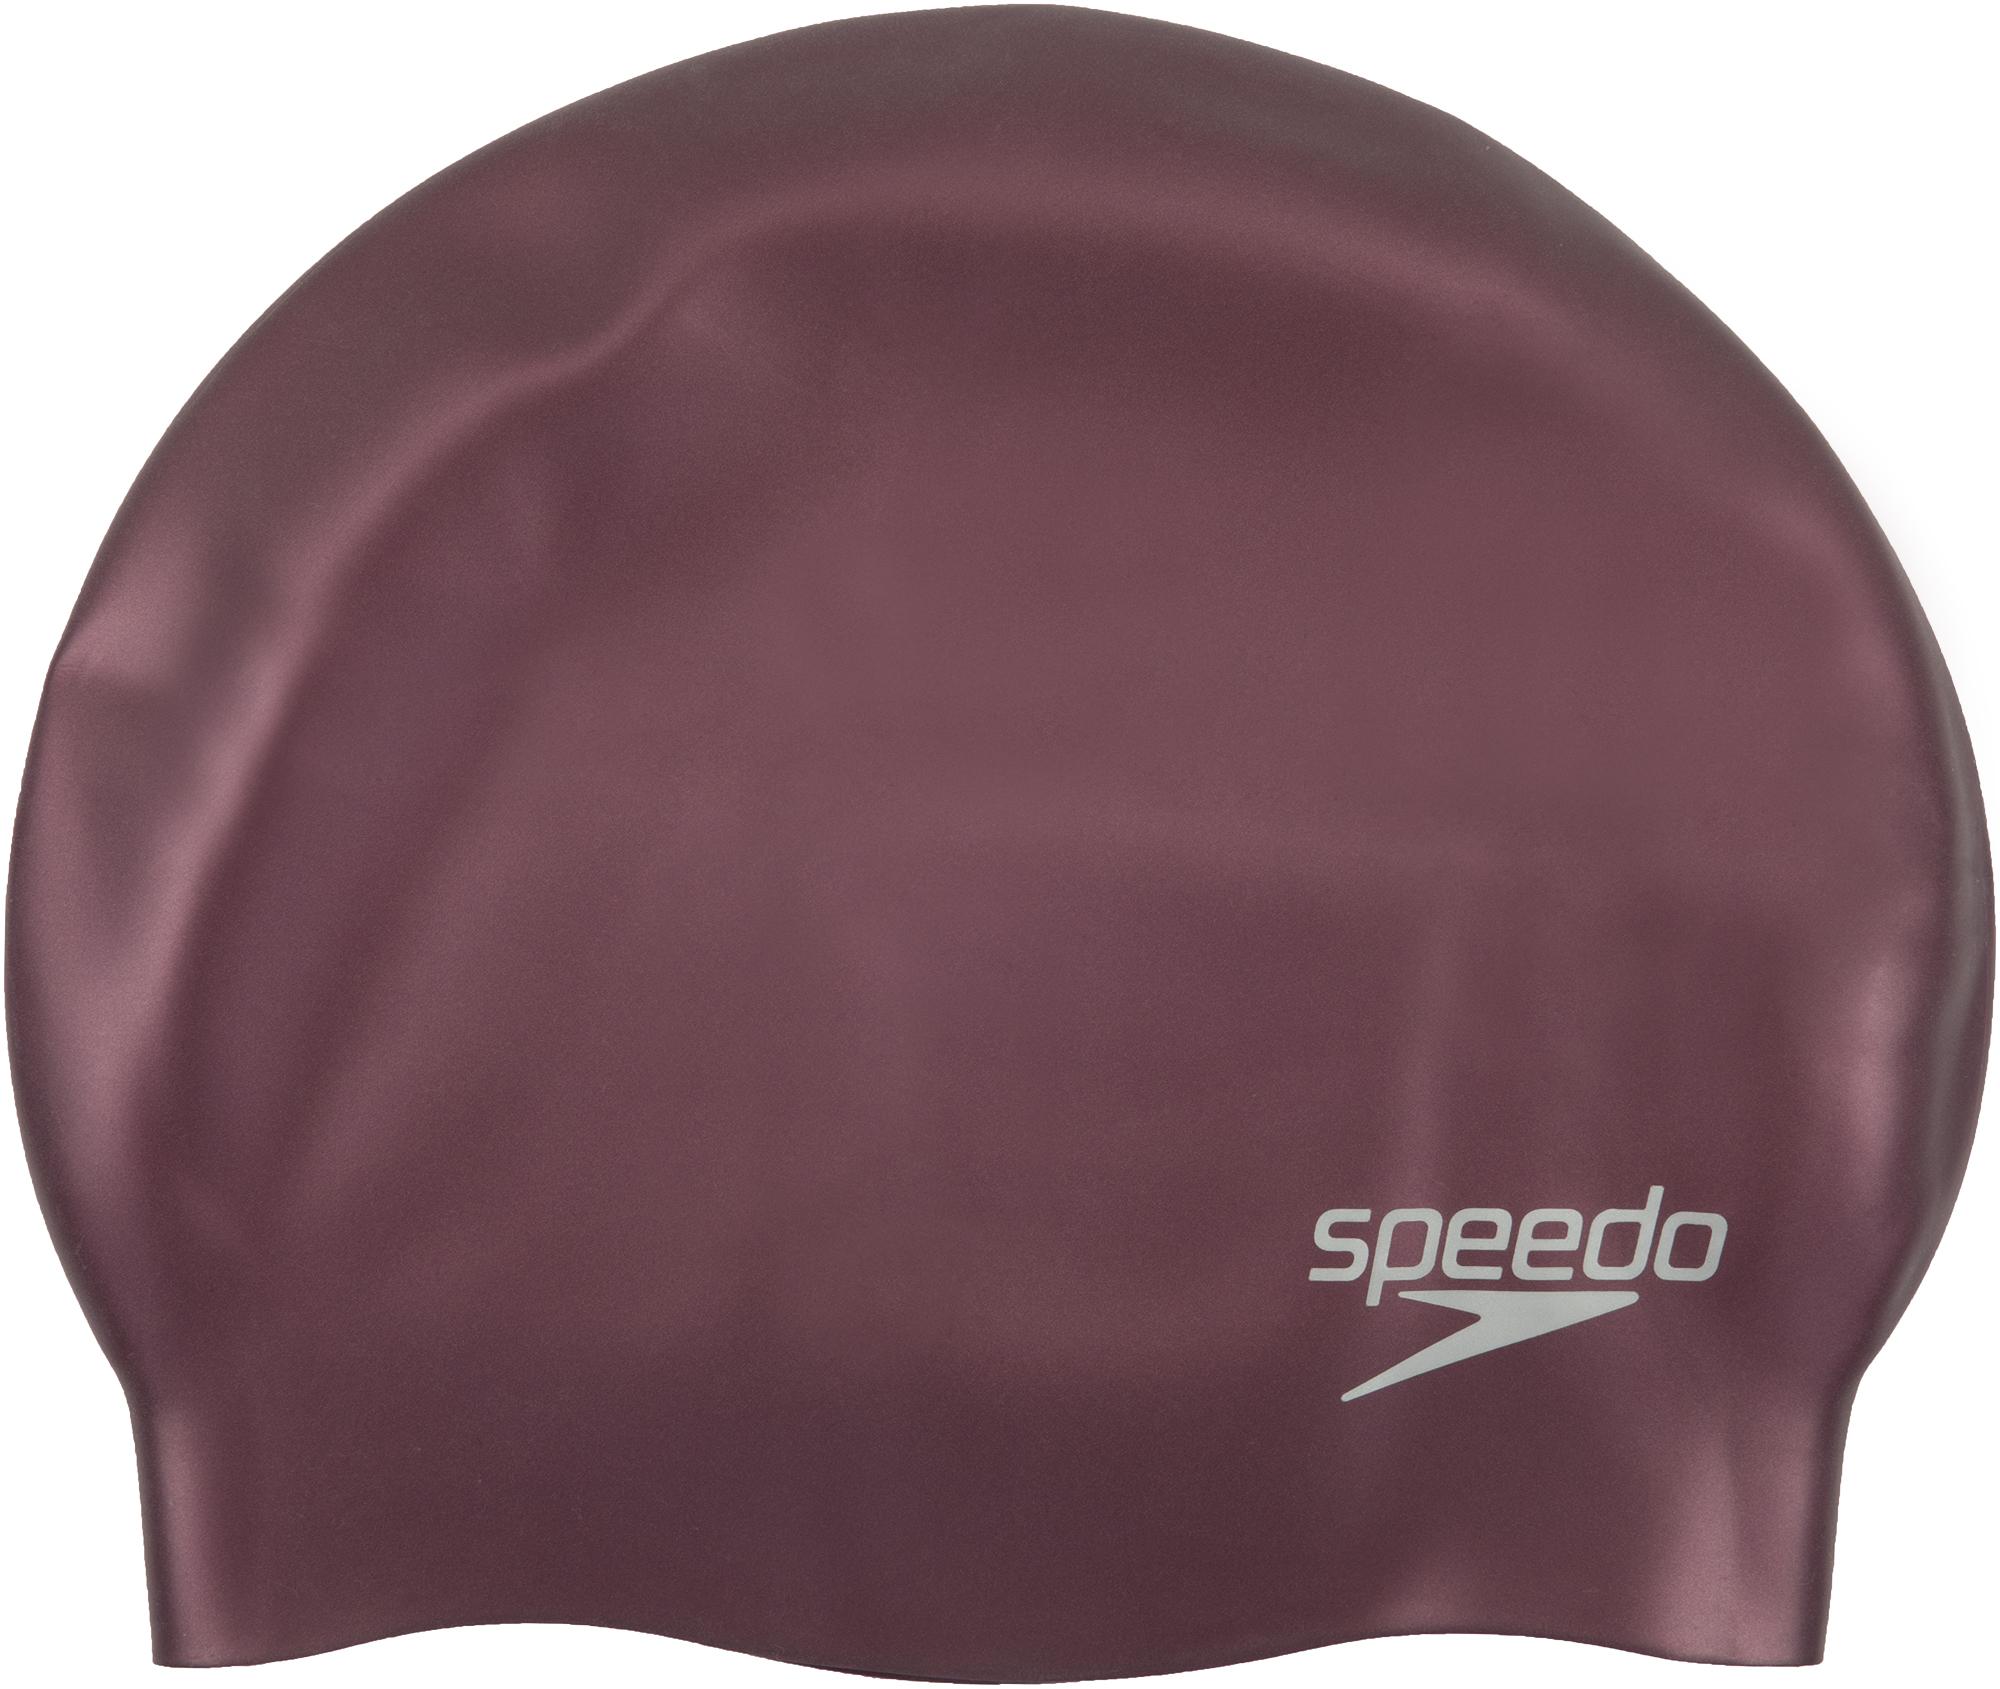 Speedo Шапочка для плавания детская Speedo Plain Moulded Silicone